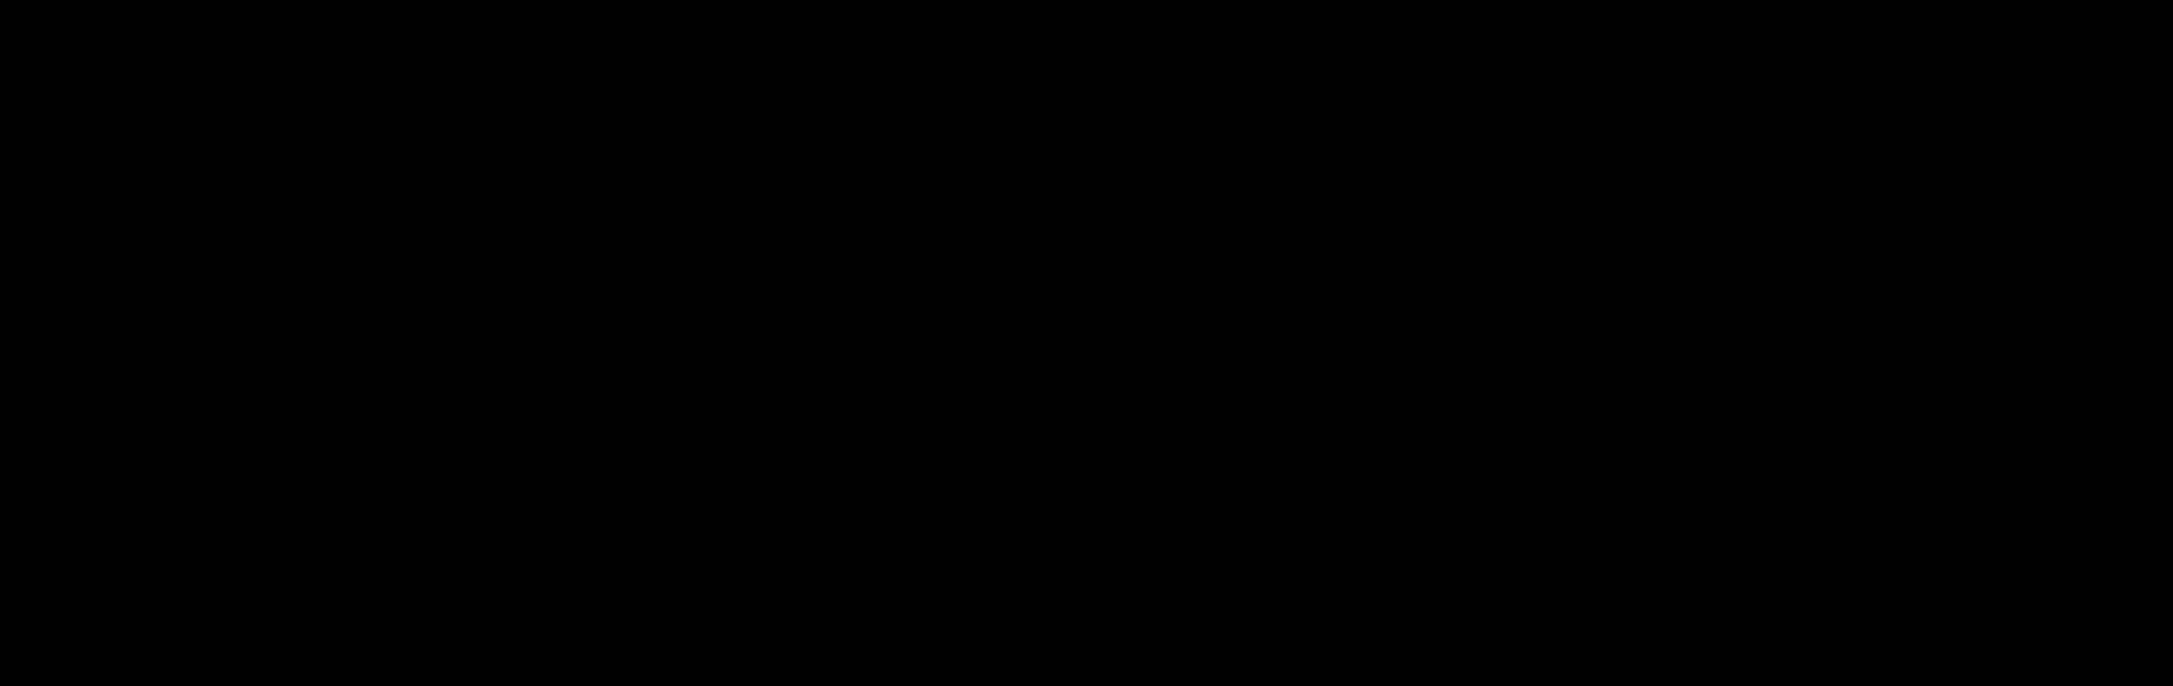 Fadenbild